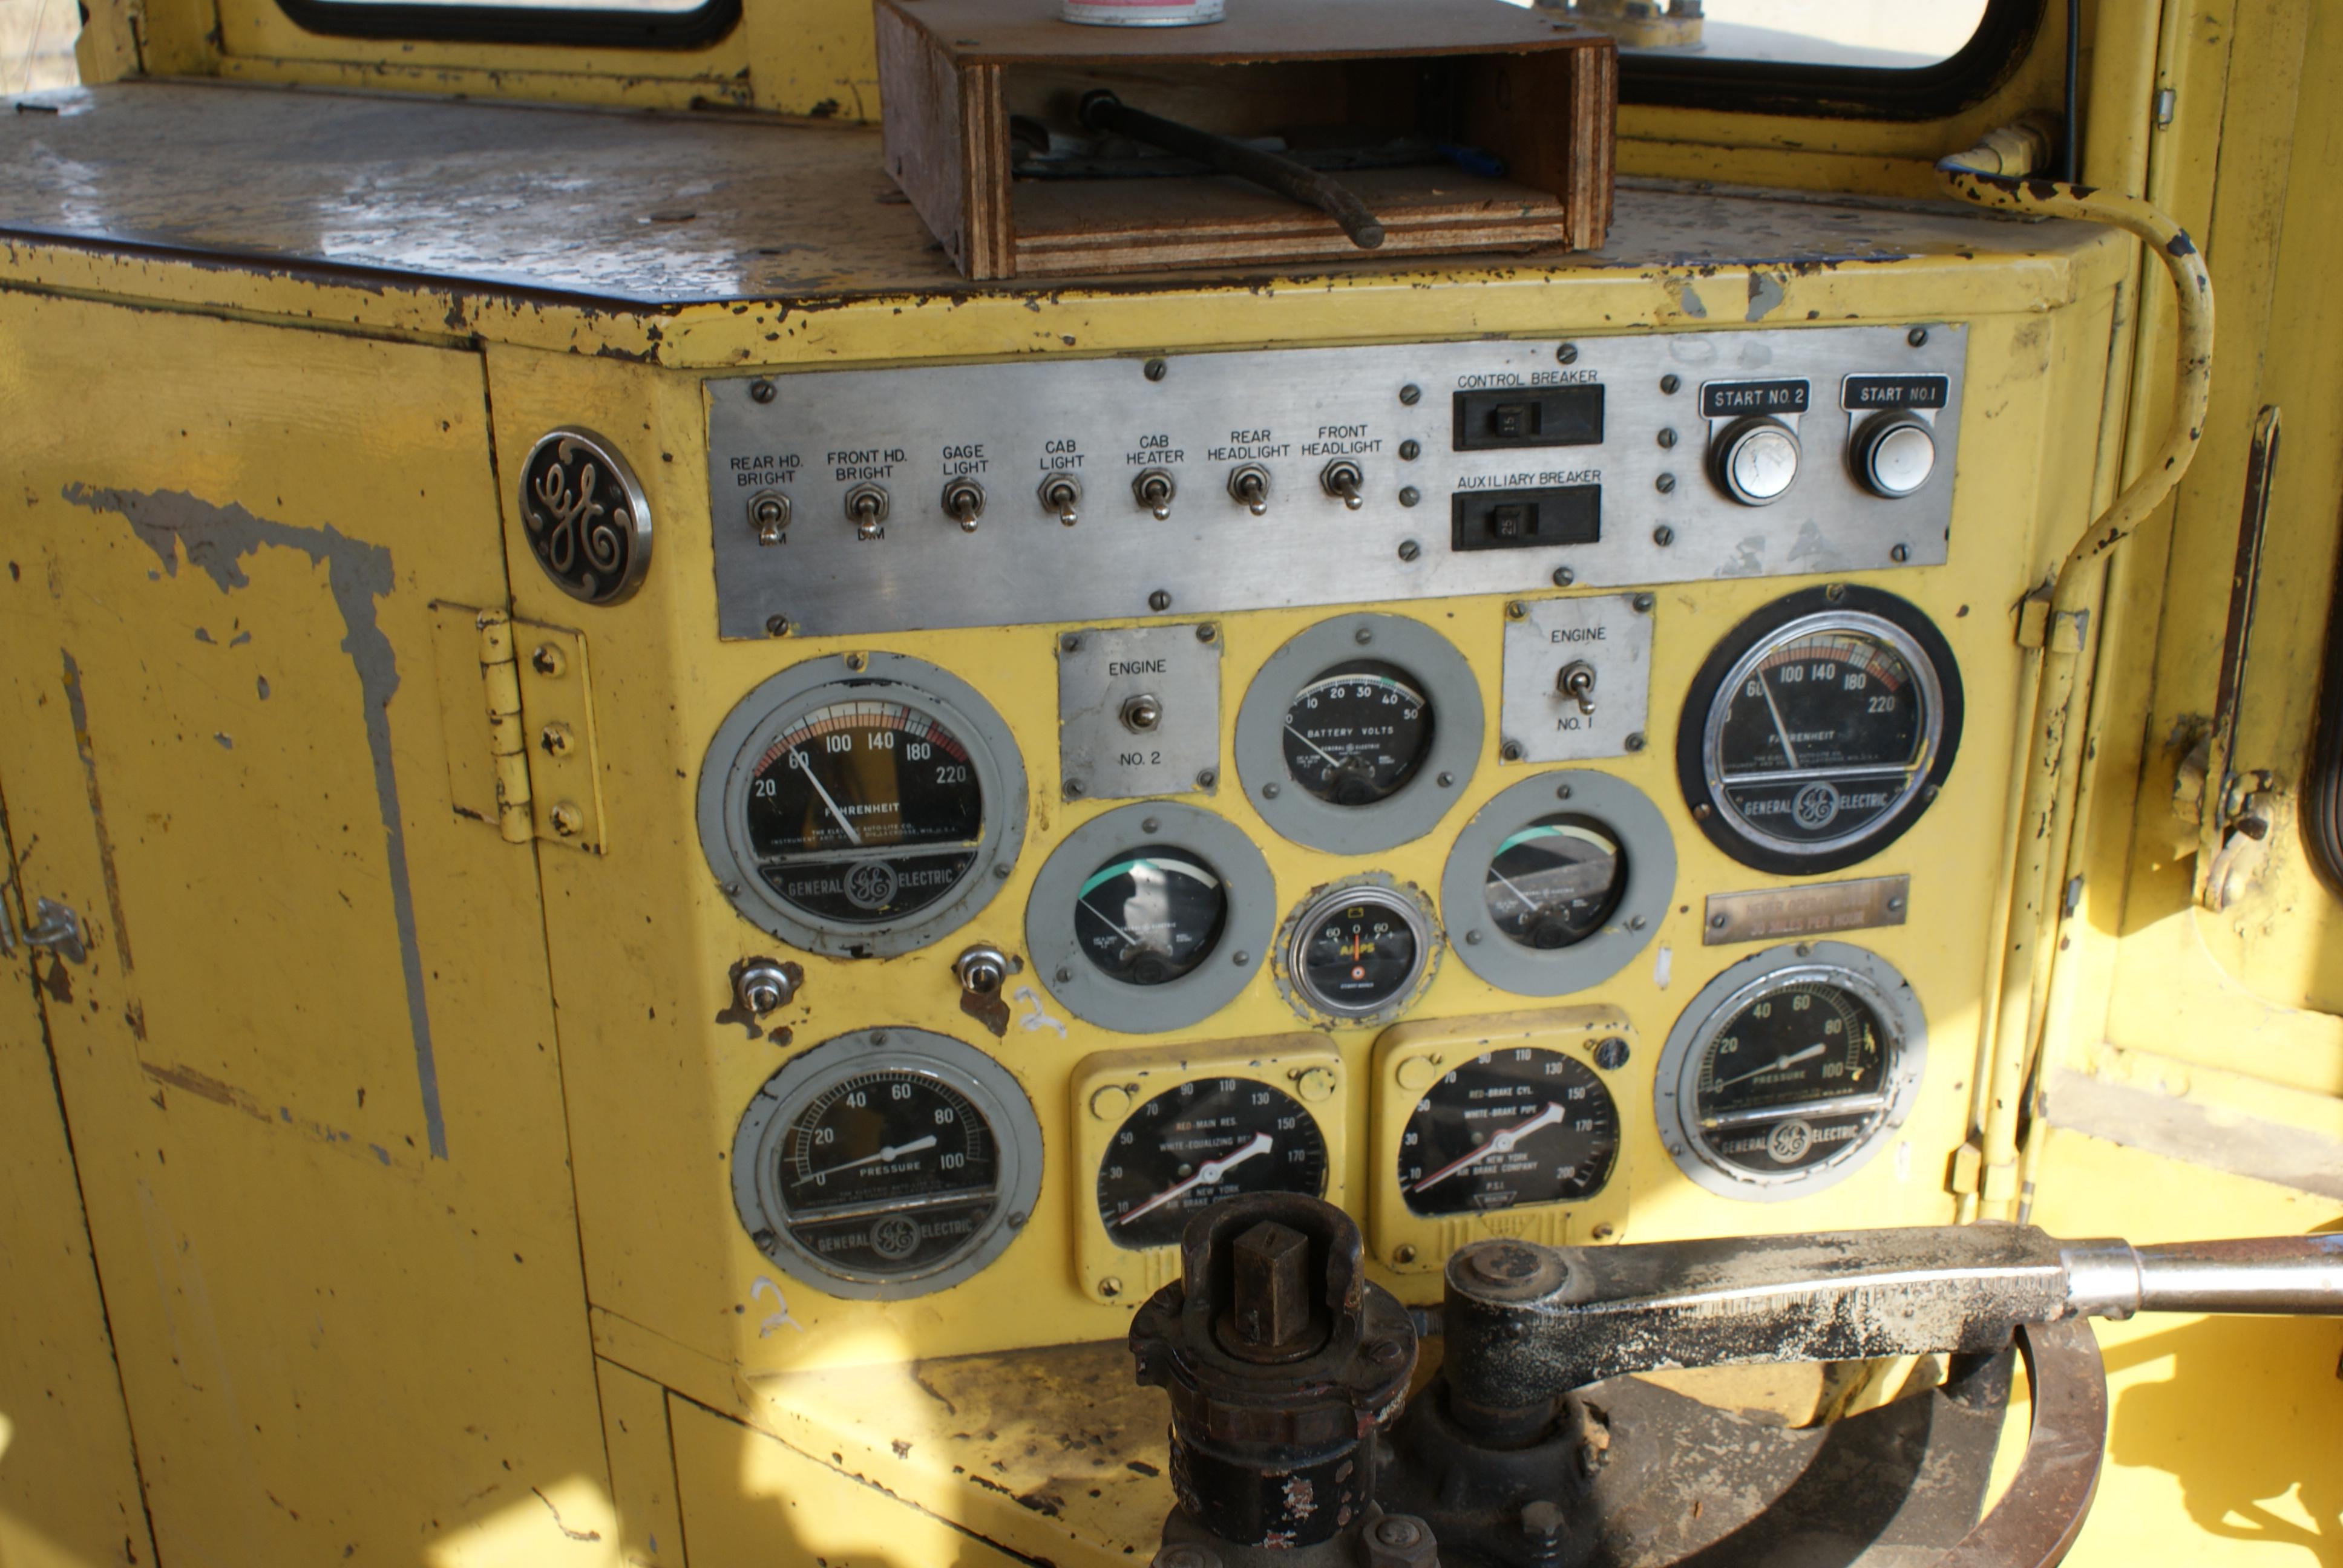 GE gauges to control a railway locomotive at a museum near Saskatoon, Canada<!-- cite web -->